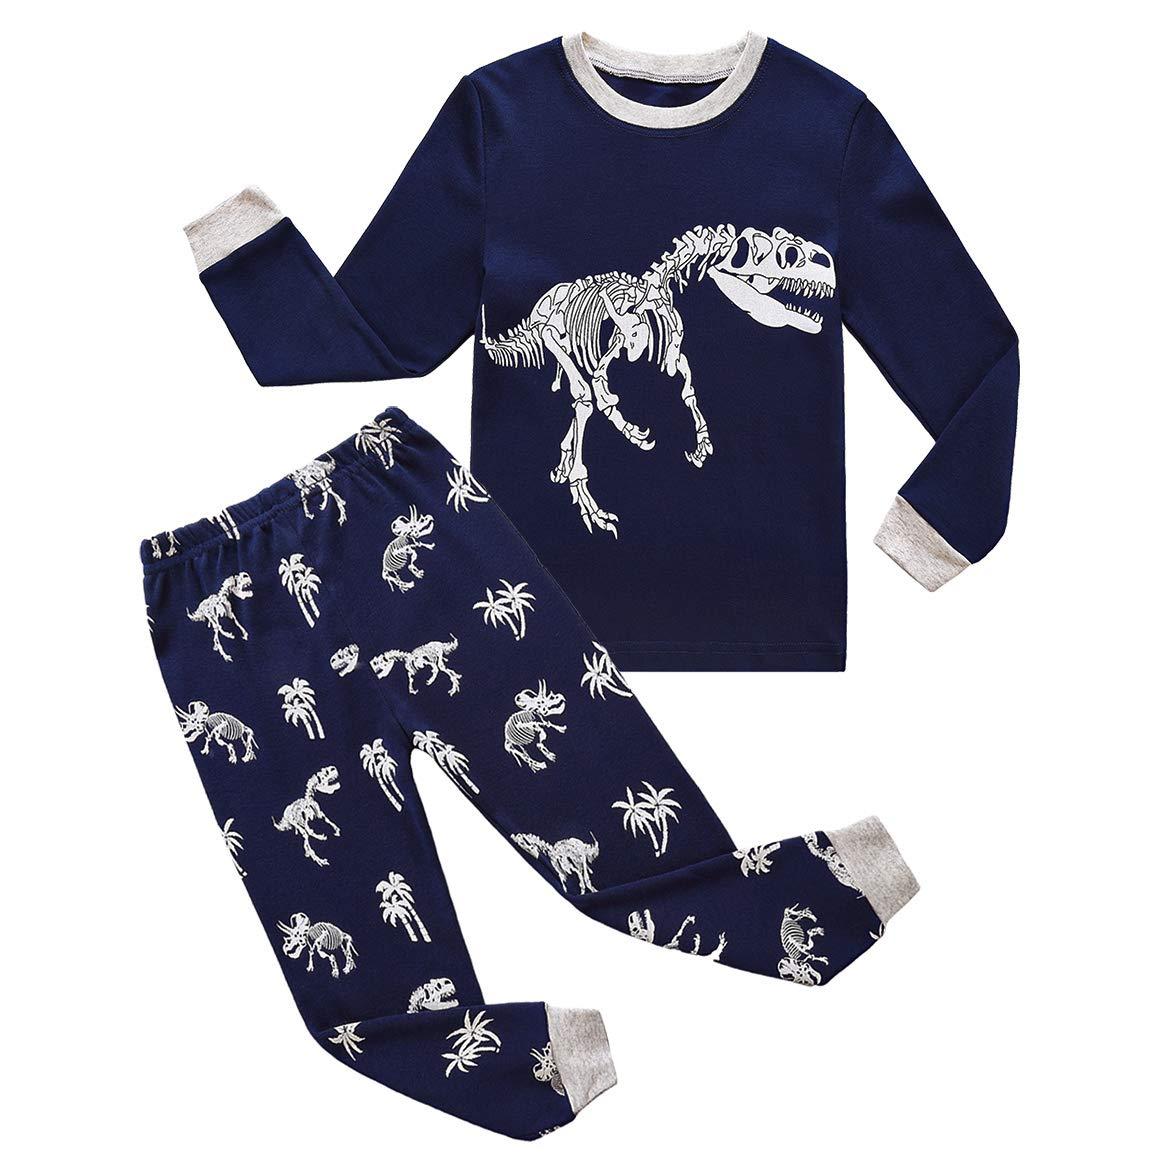 RKOIAN Little Boys Pajamas Sets Toddler Pjs 100% Cotton Kids Sleepwears